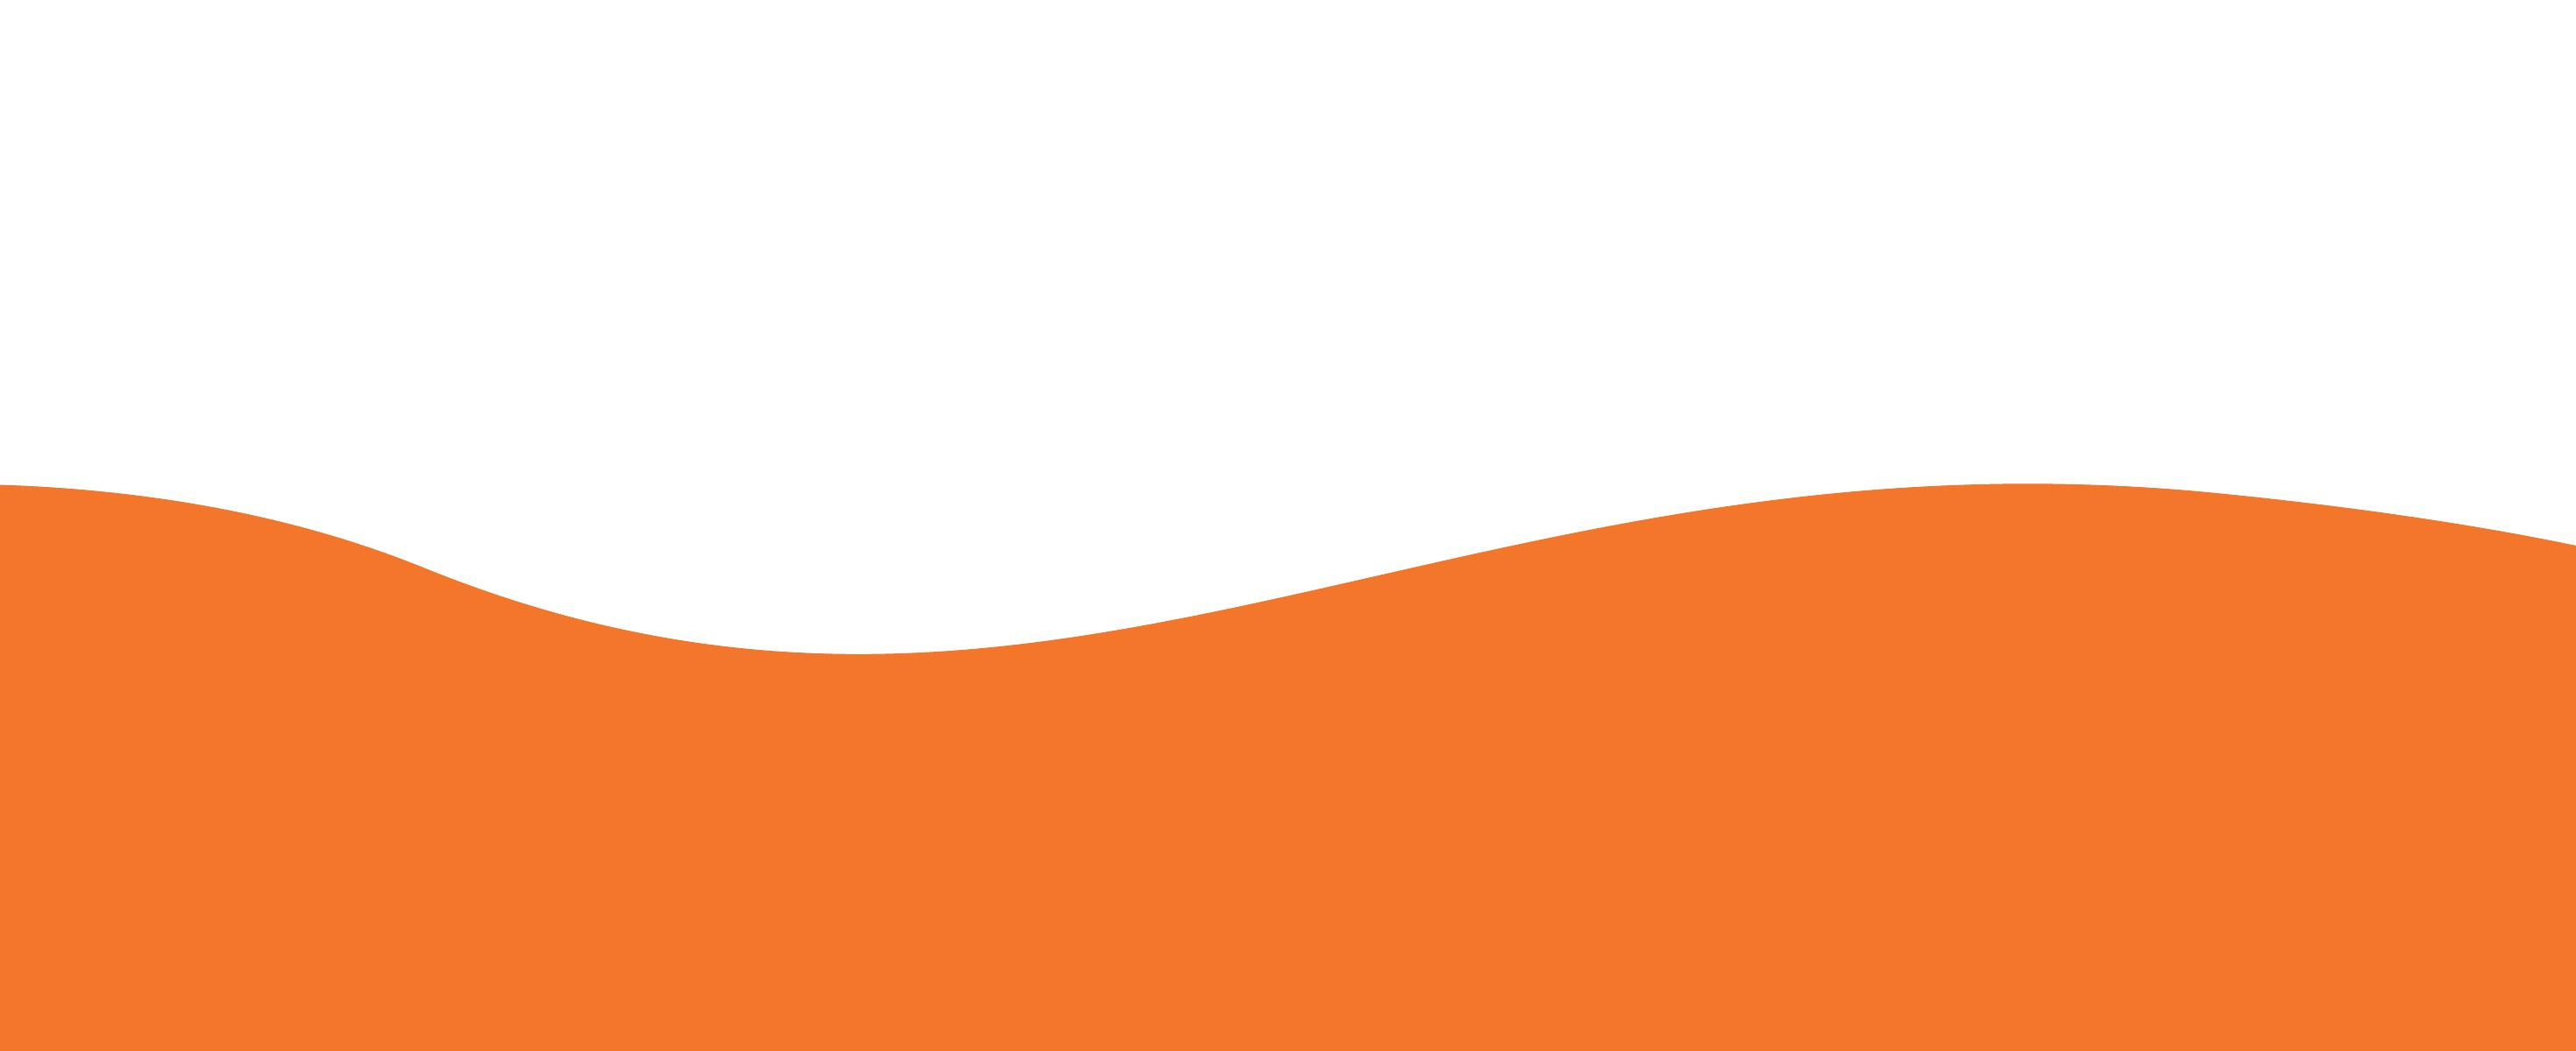 Decorative orange and white wavy background patten